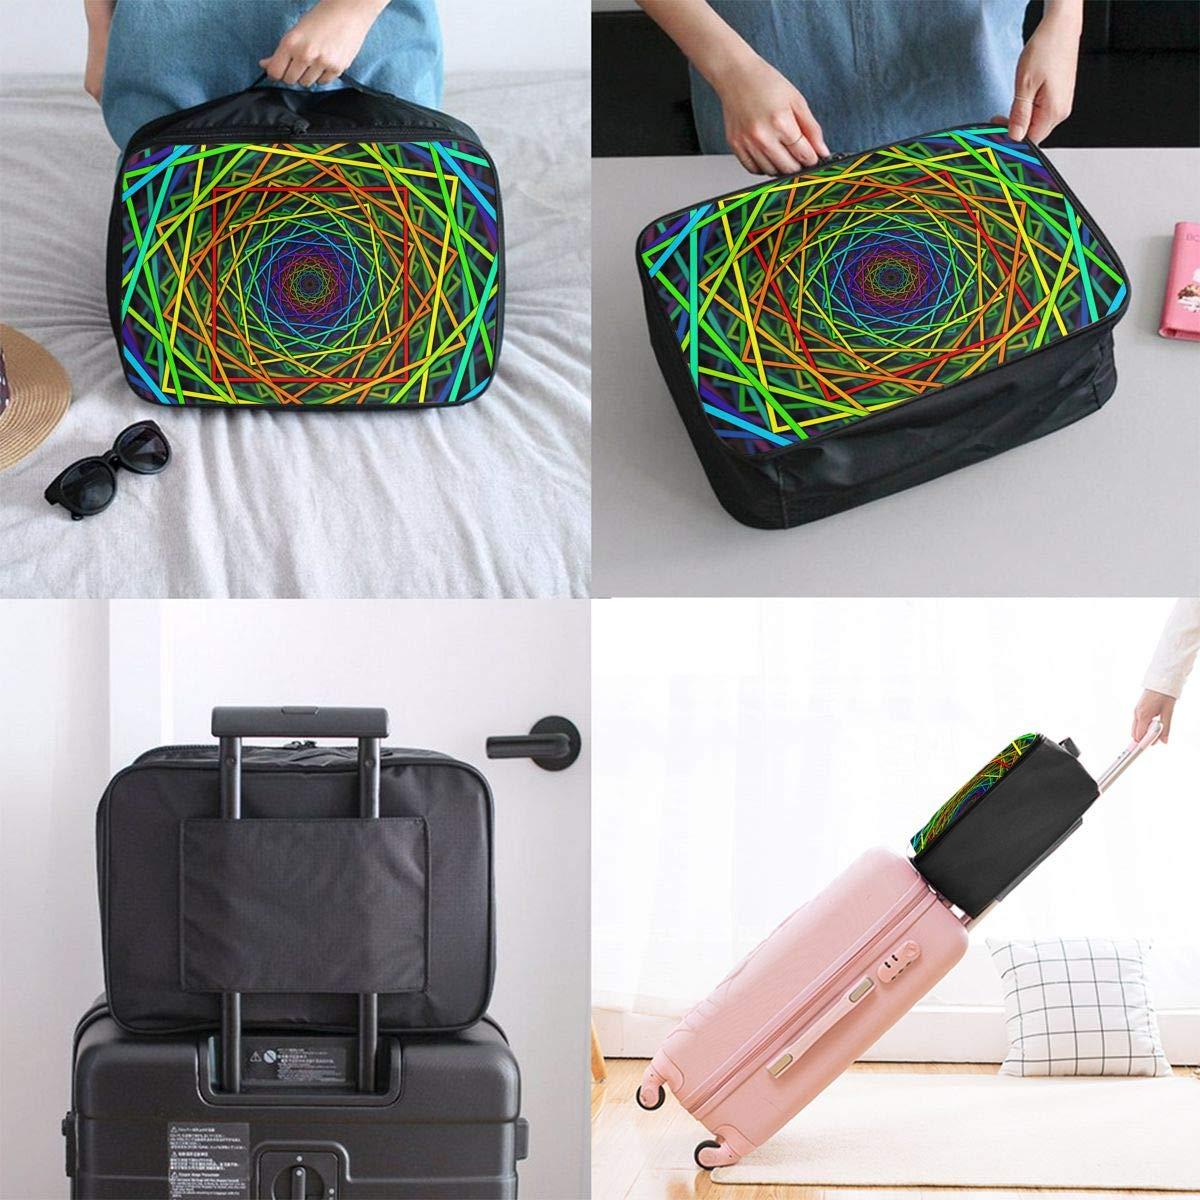 Travel Luggage Duffle Bag Lightweight Portable Handbag Abstract Colorful Kaleidoscope Pattern Large Capacity Waterproof Foldable Storage Tote